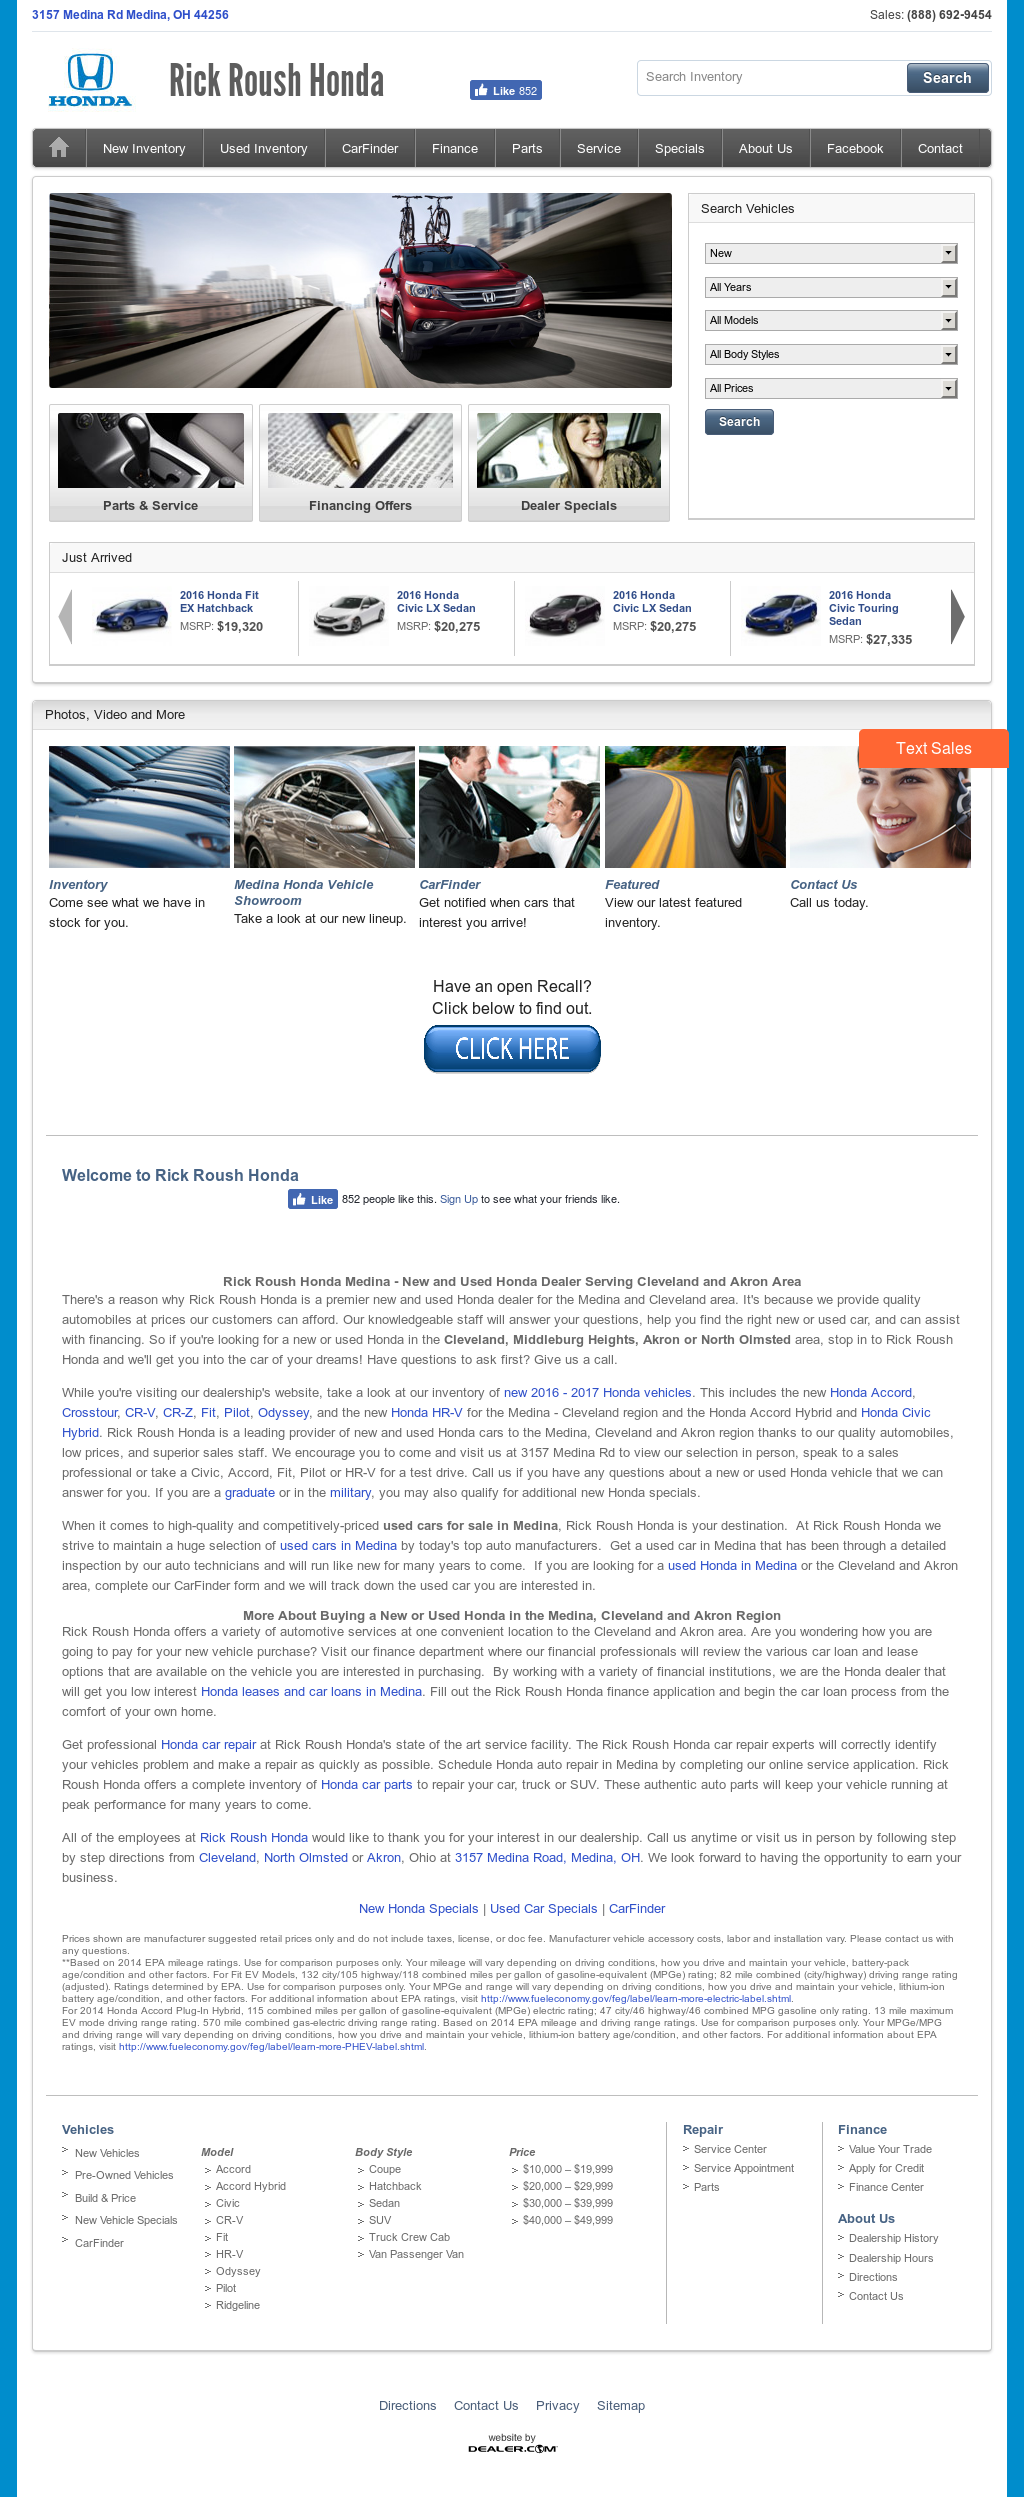 Rick Roush Honda Competitors, Revenue And Employees   Owler Company Profile